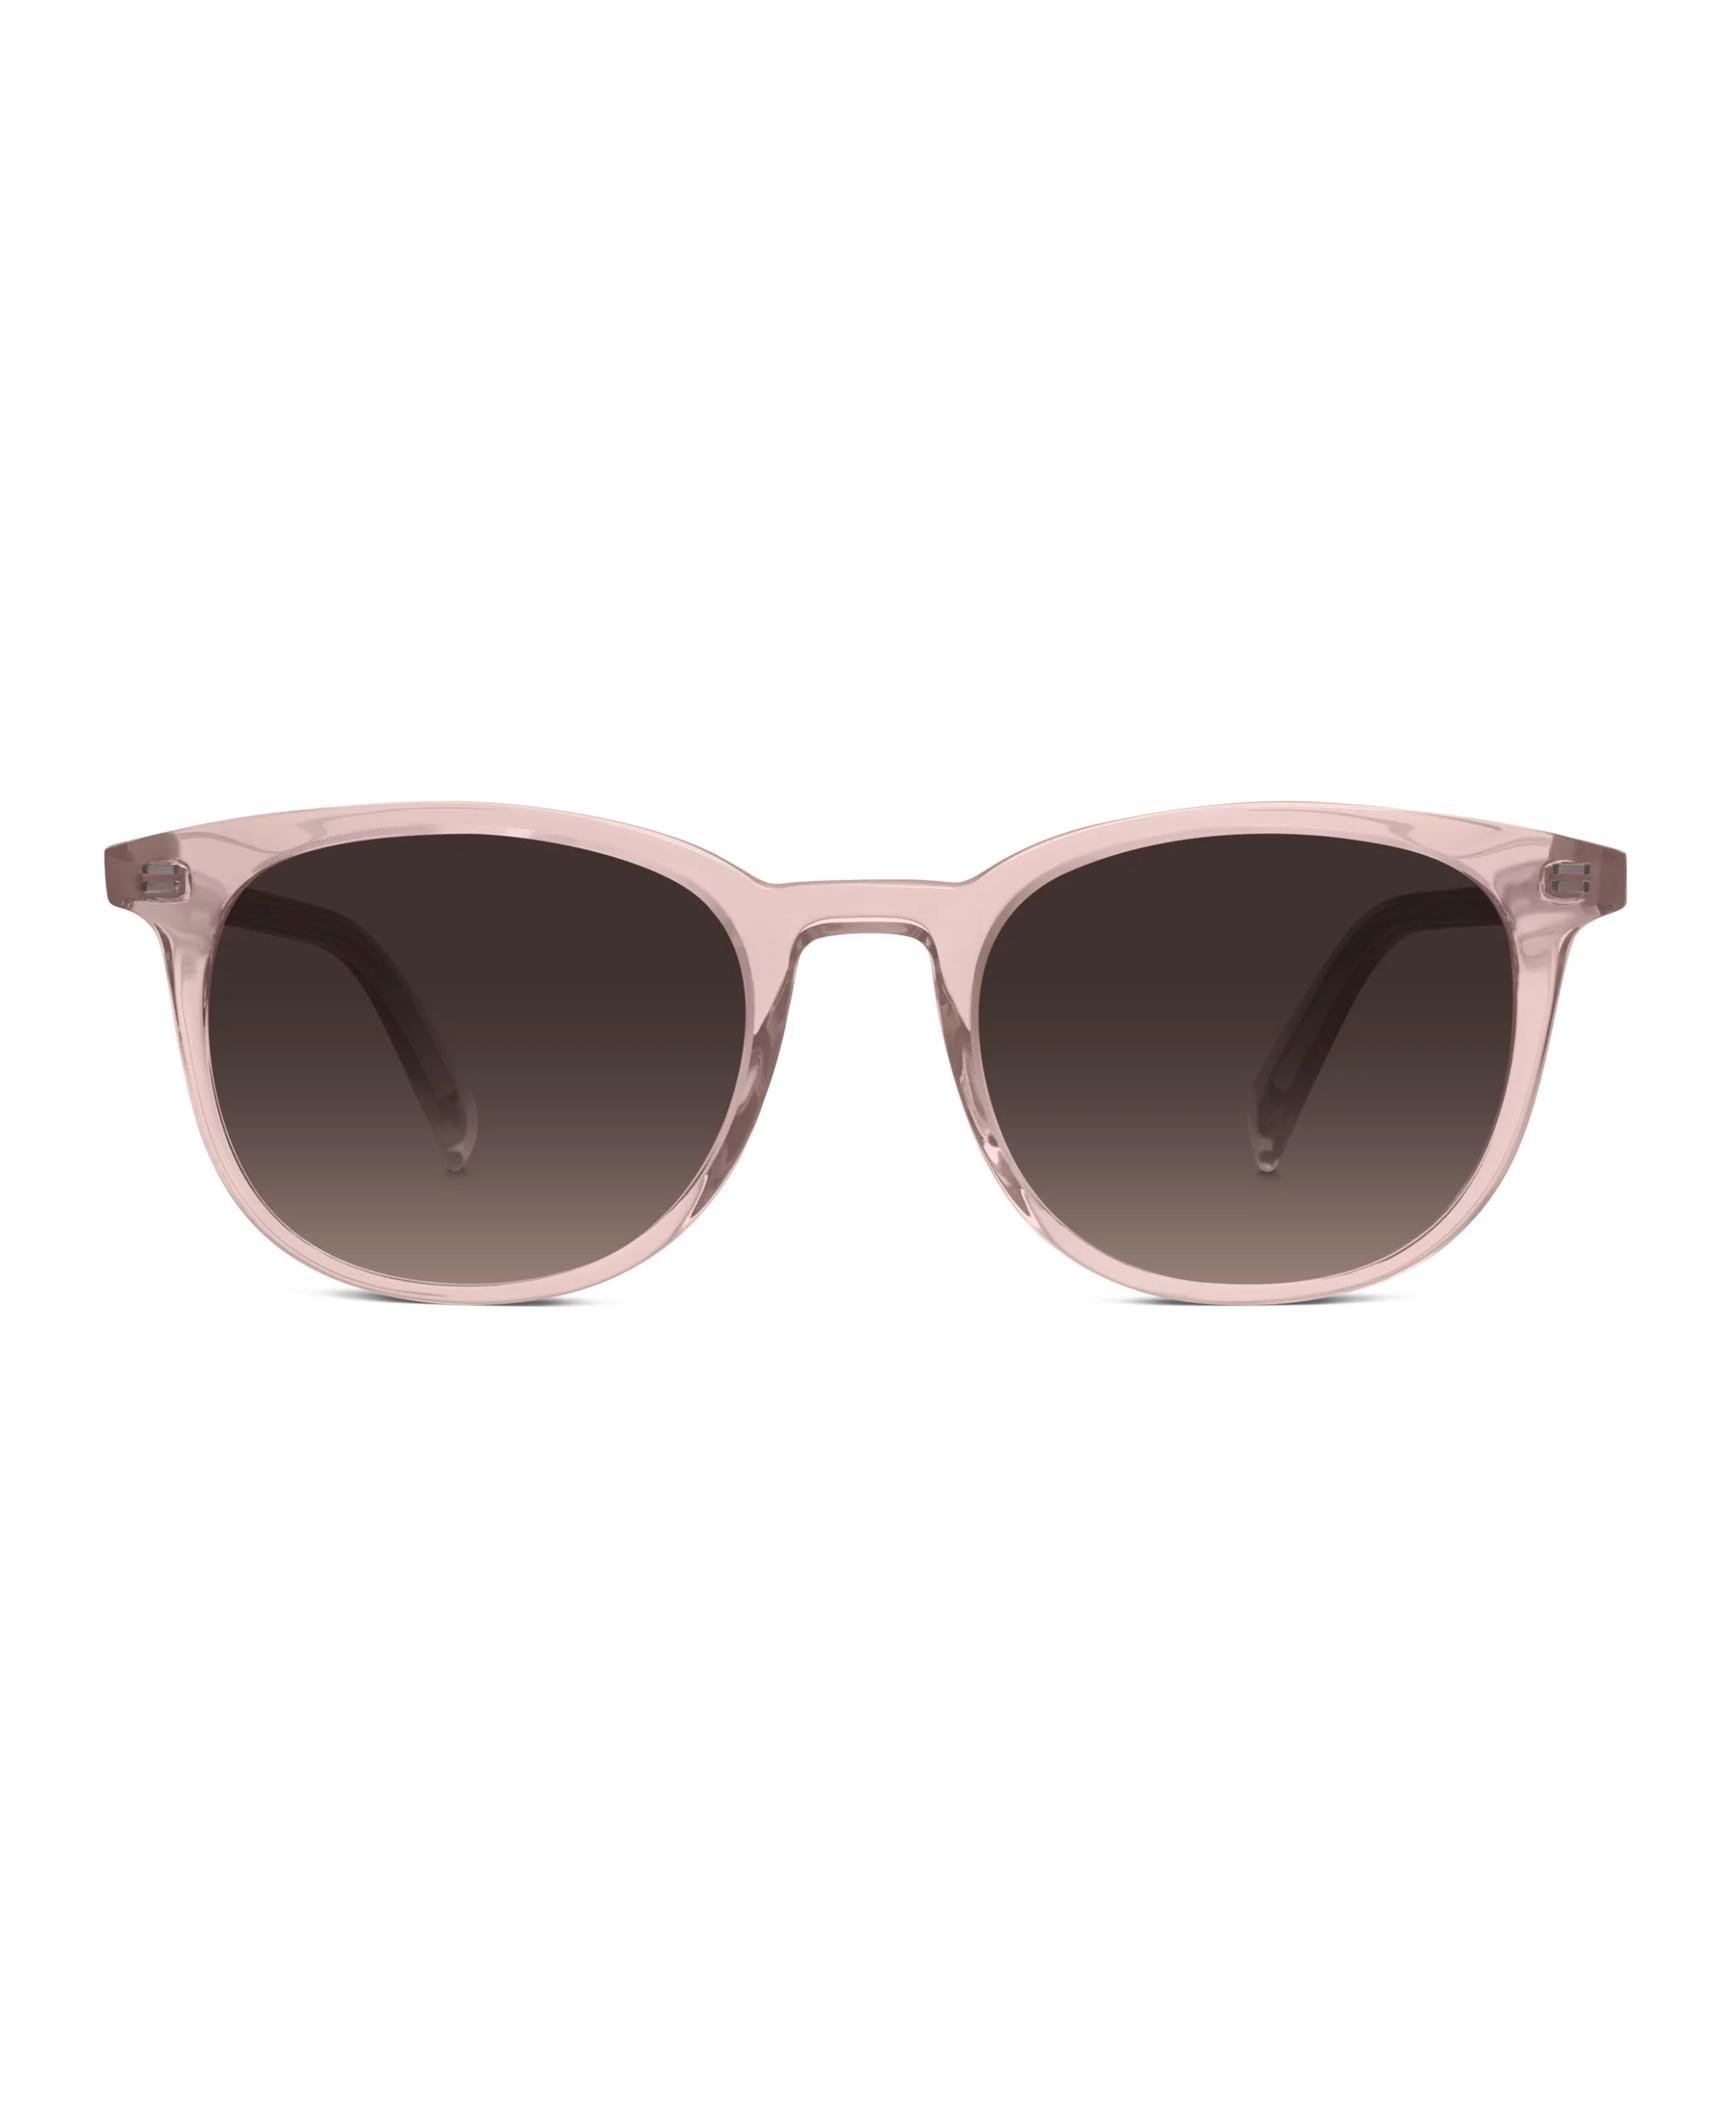 Durand Sunglasses